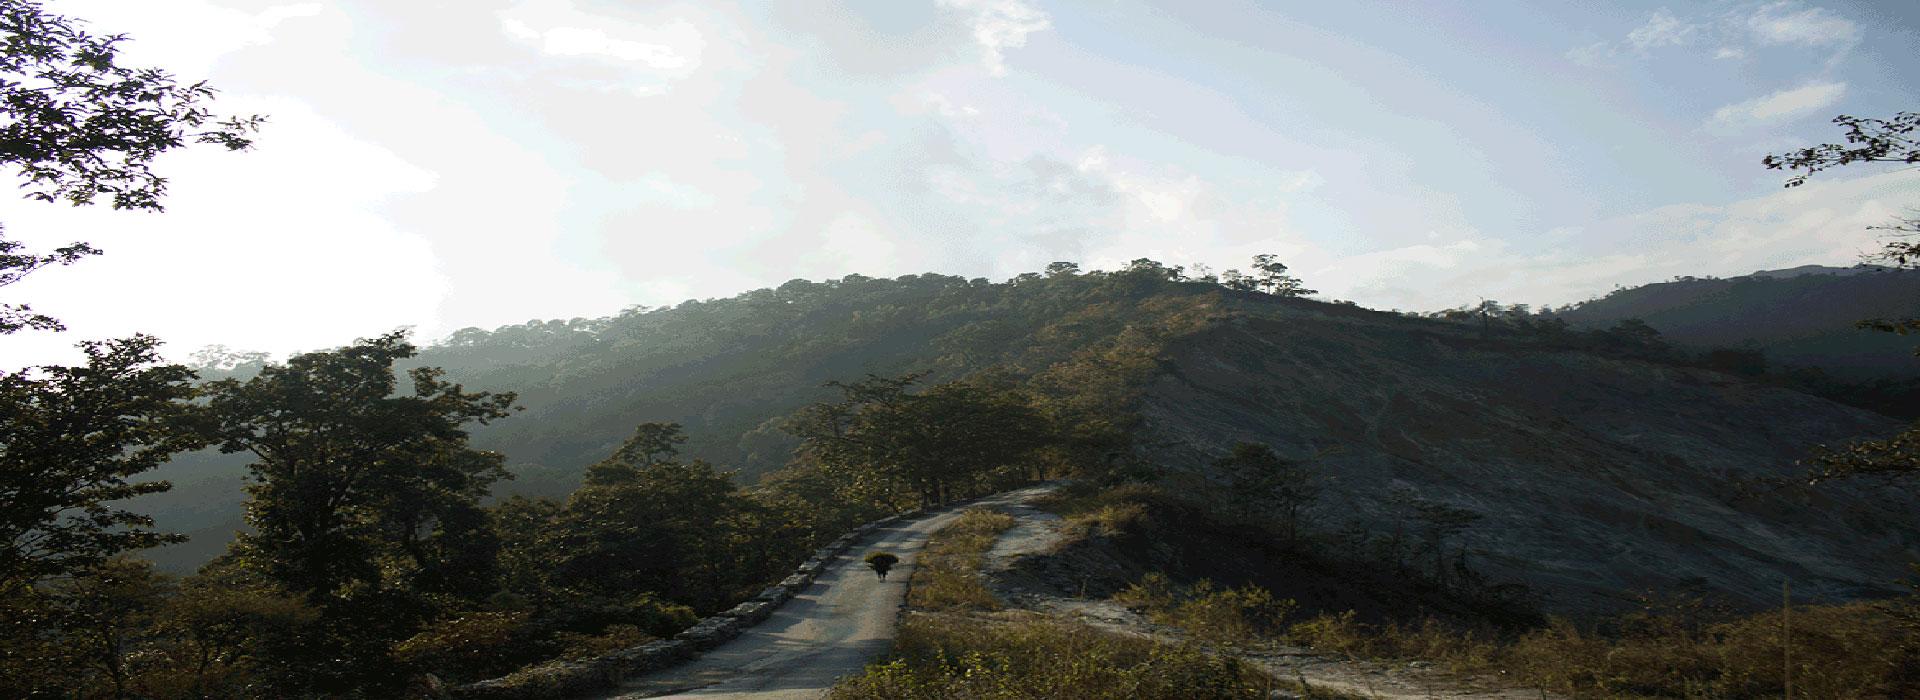 The road to Latpanchar Darjeeling